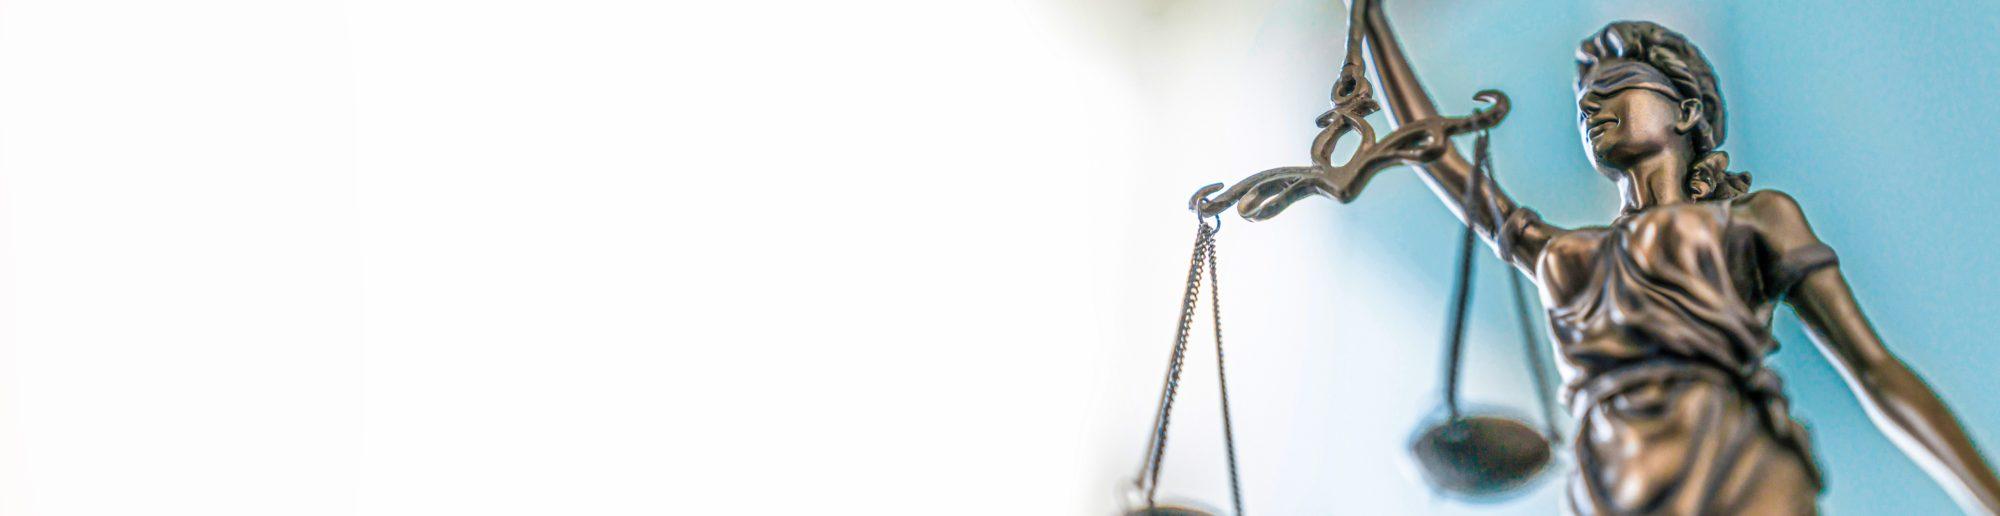 Balance of Justice bronze statue